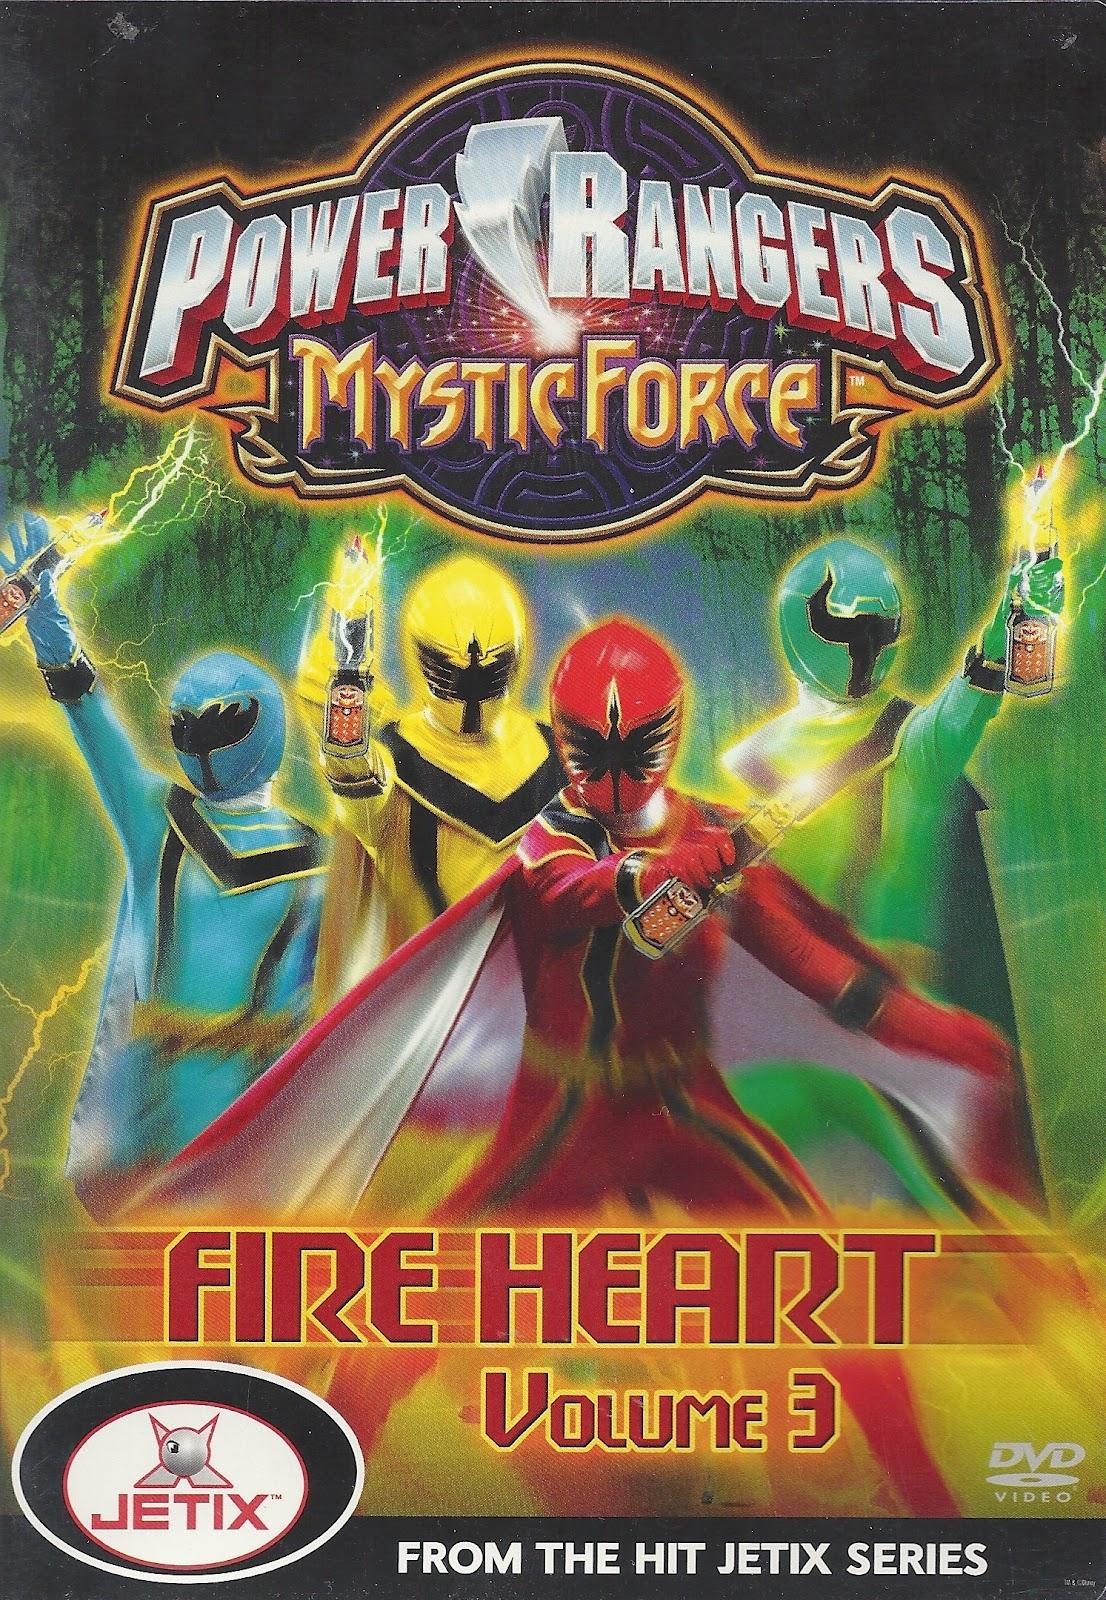 List of Power Rangers Mystic Force episodes